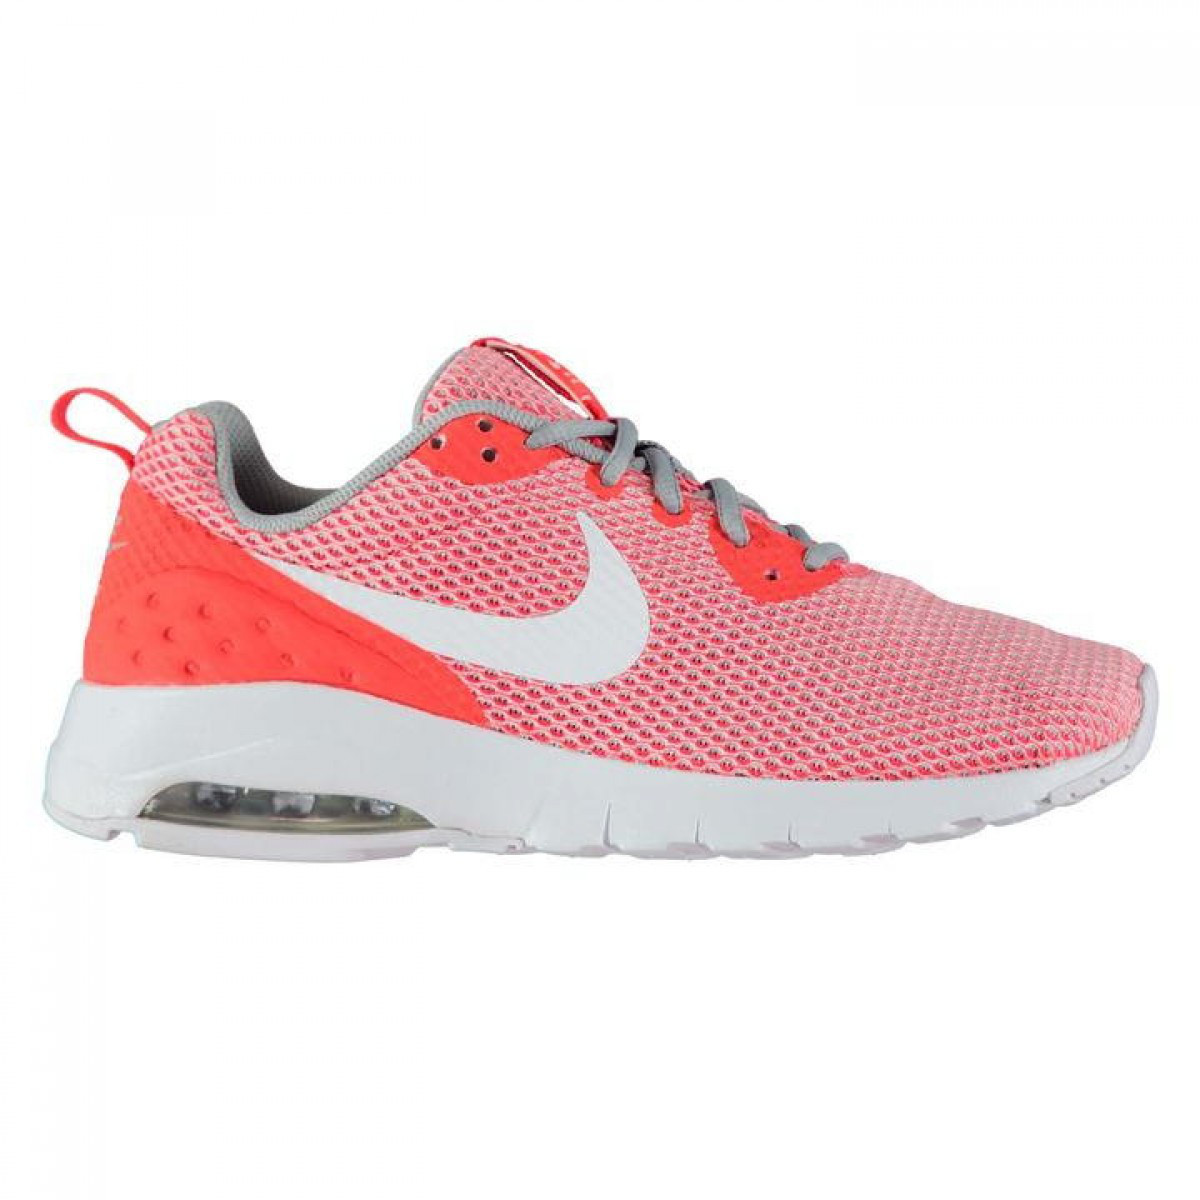 Кроссовки Nike Air Max Motion SE Red White - Оригинал - FAIR - оригинальная  одежда 435efa6e3a5